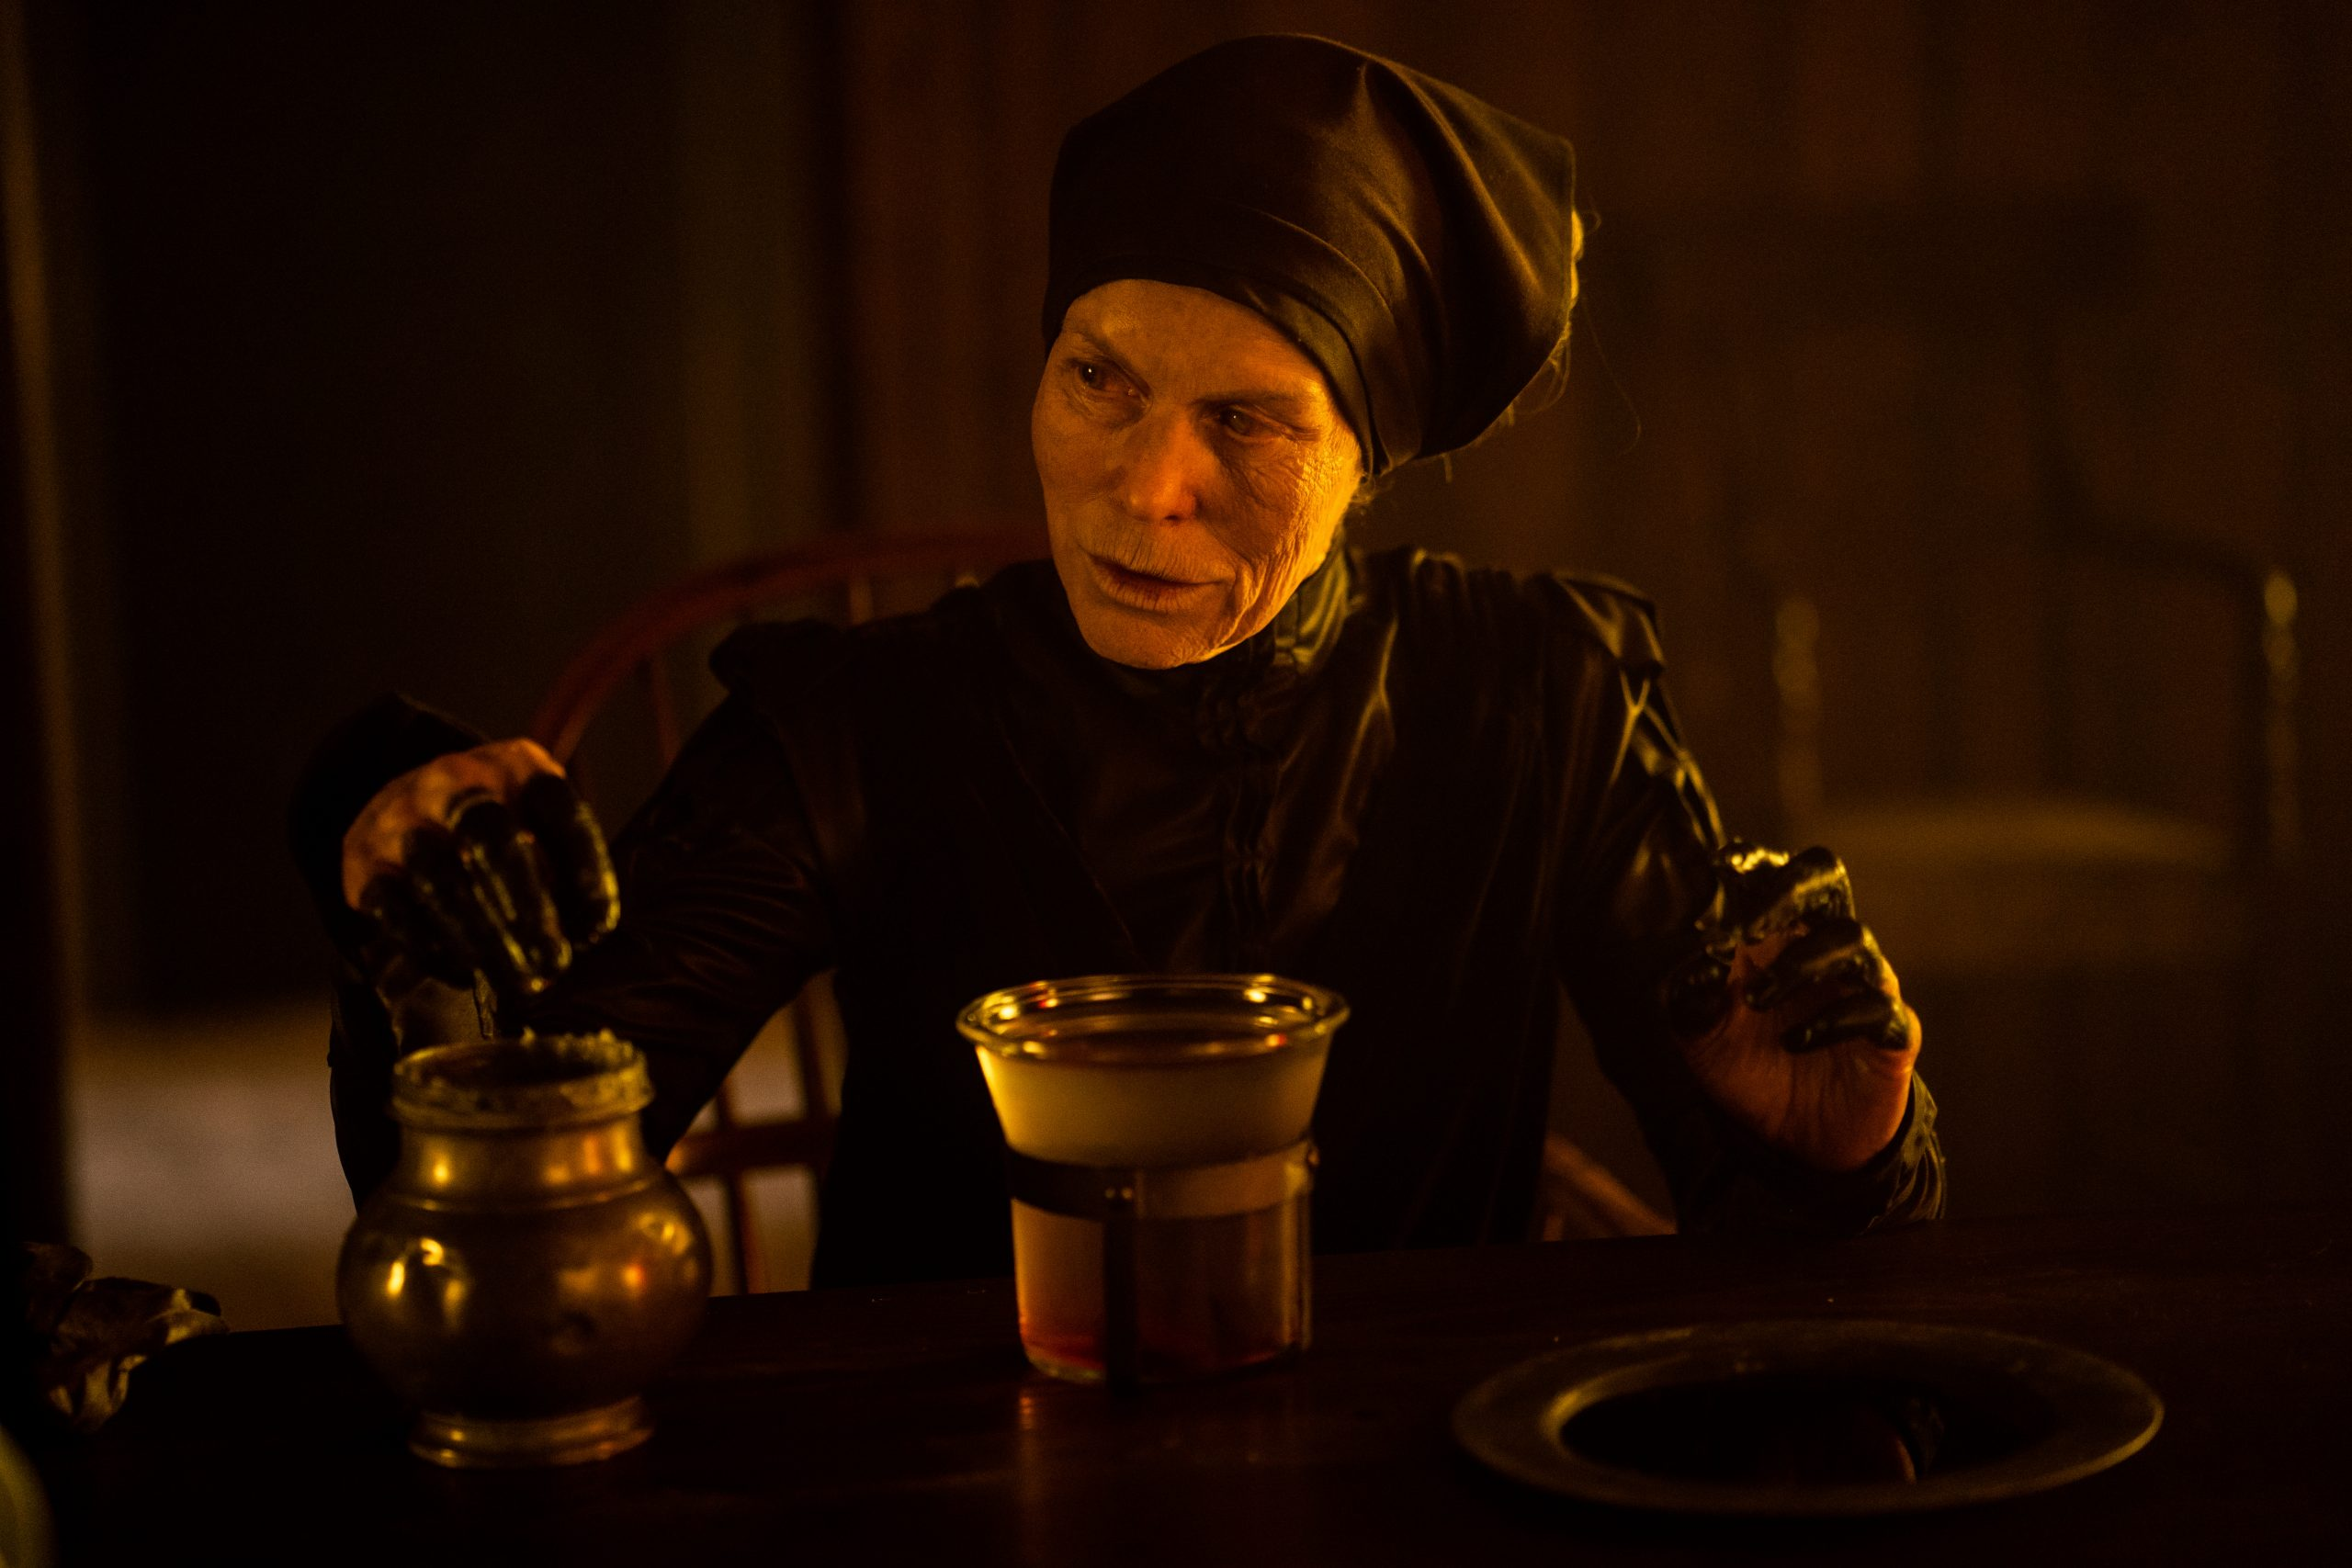 [Interview] Actress Alice Krige for GRETEL & HANSEL